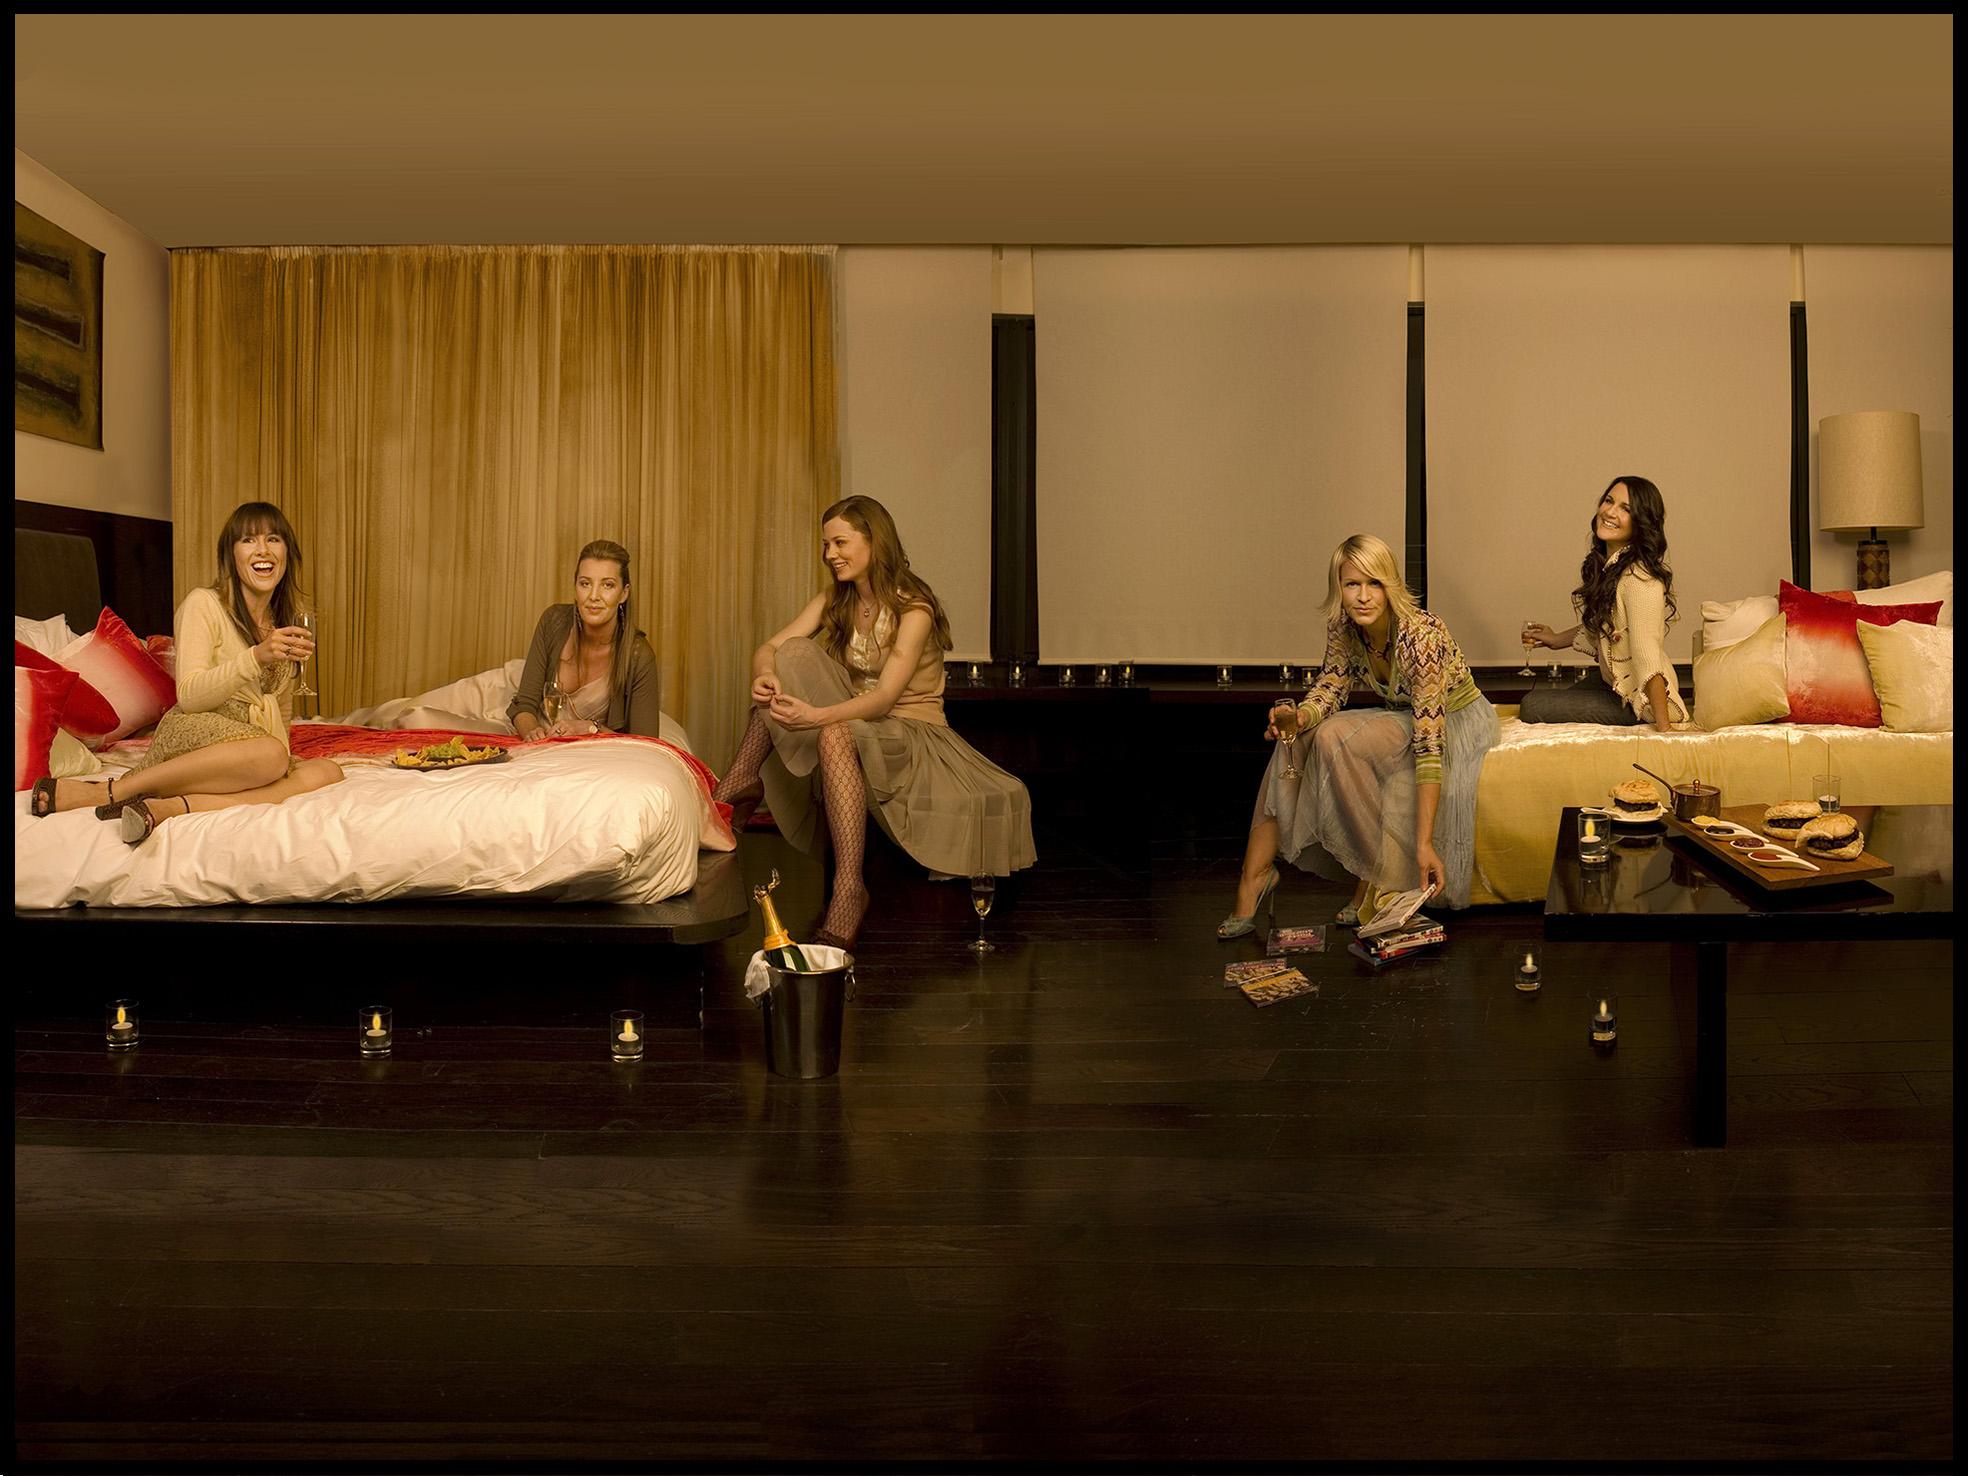 The Pyjama Party - Women in PR for Image Magazine